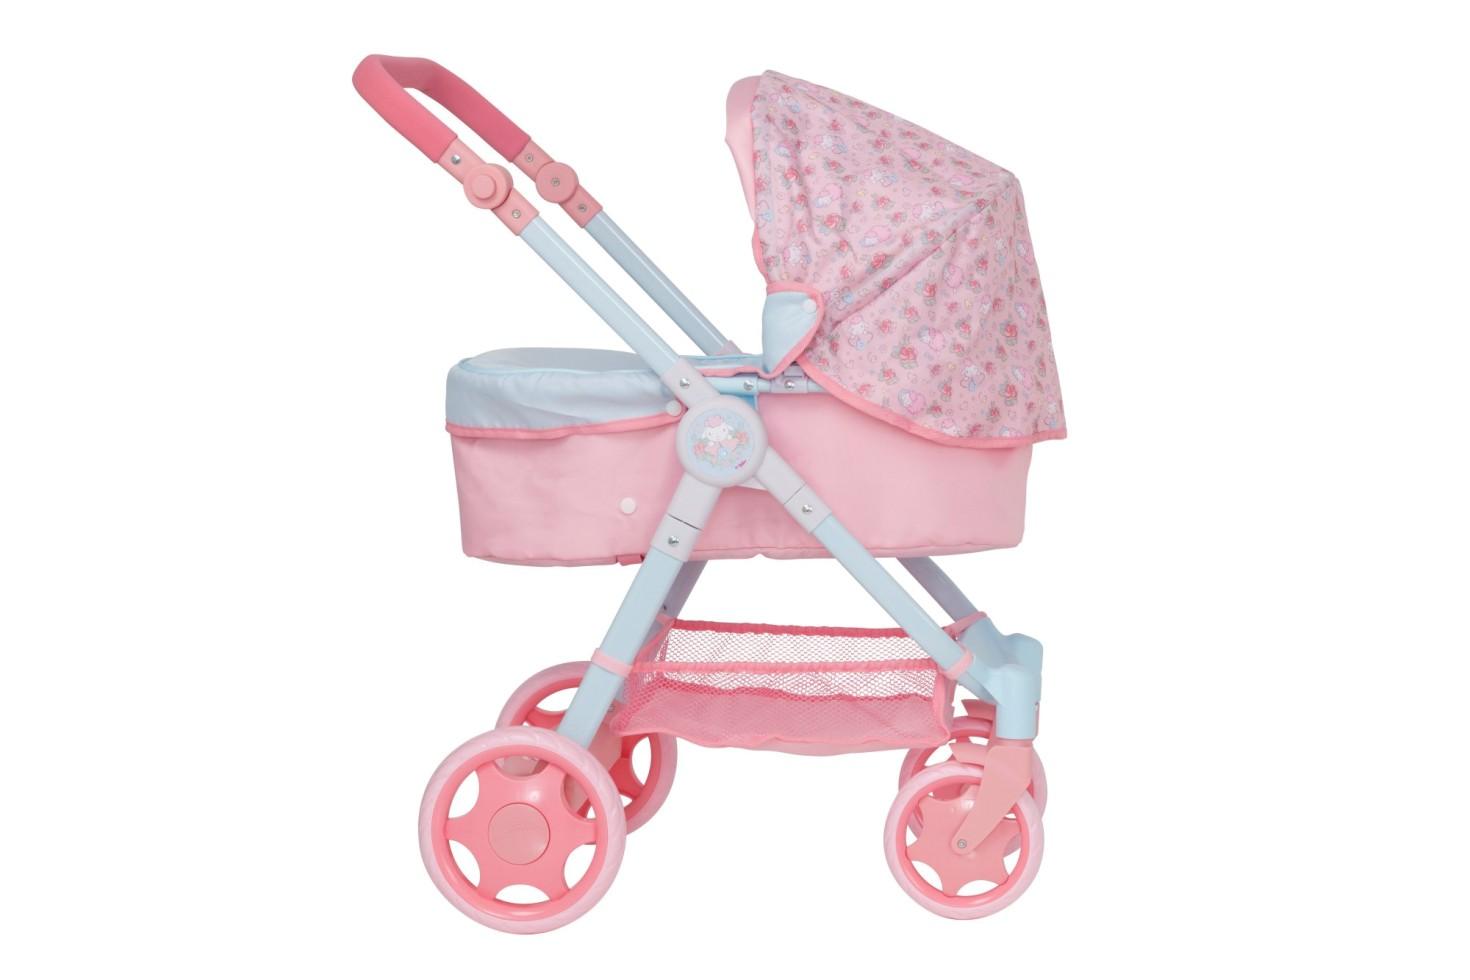 BABY ANNABELLE BABY EVOLVE TRAVEL SYSTEM